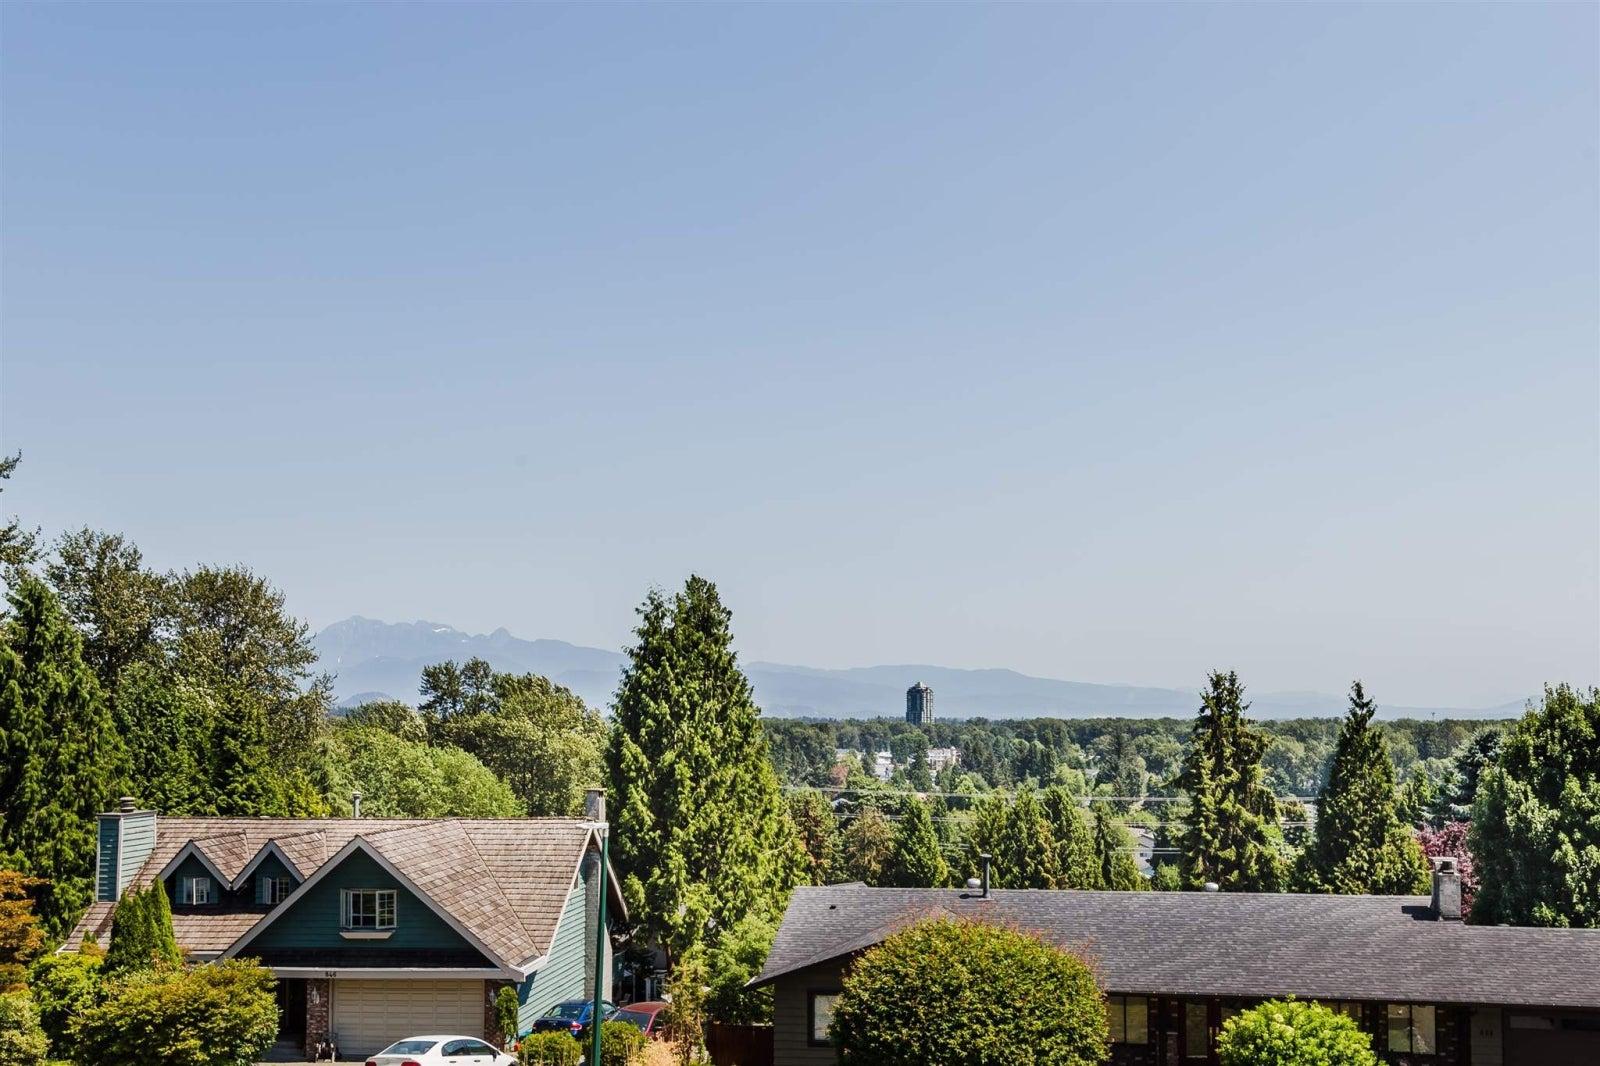 843 REDDINGTON COURT - Ranch Park House/Single Family for sale, 5 Bedrooms (R2602360) #1